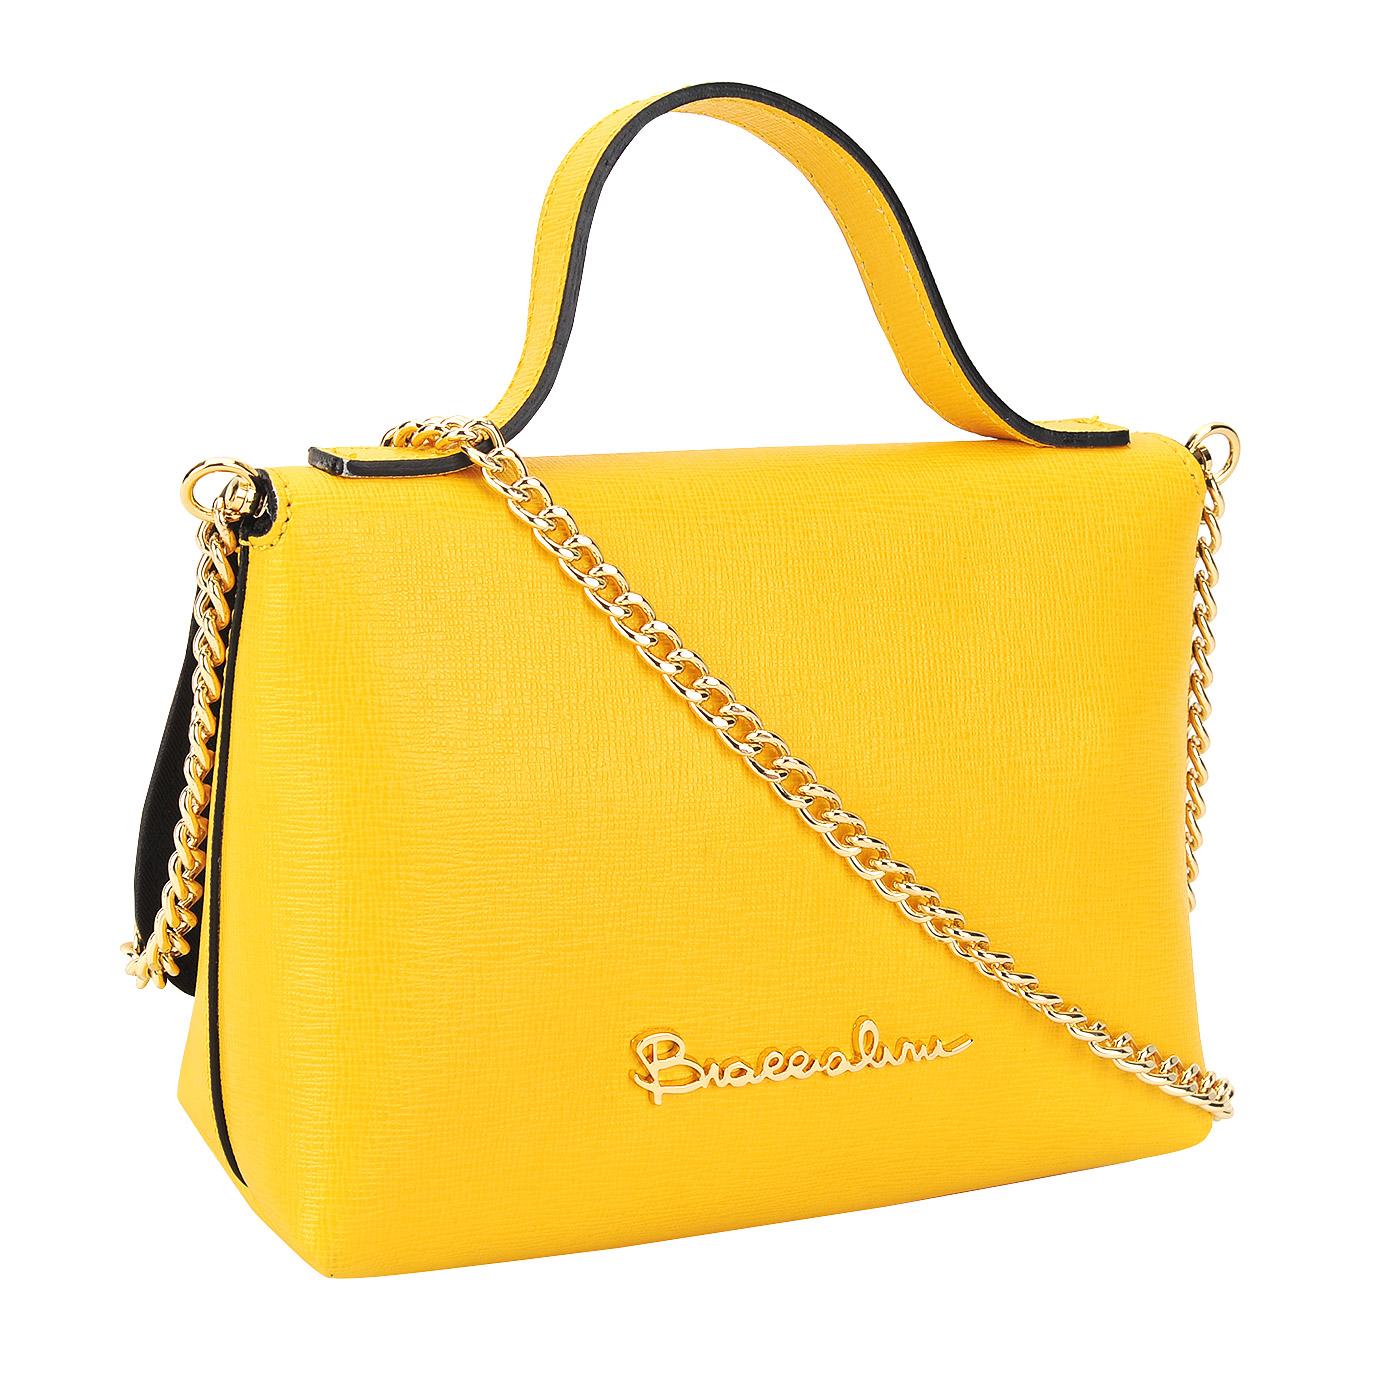 9abc42b08e68 Женская кожаная сумка Braccialini Ninfea B10691_giallo ...